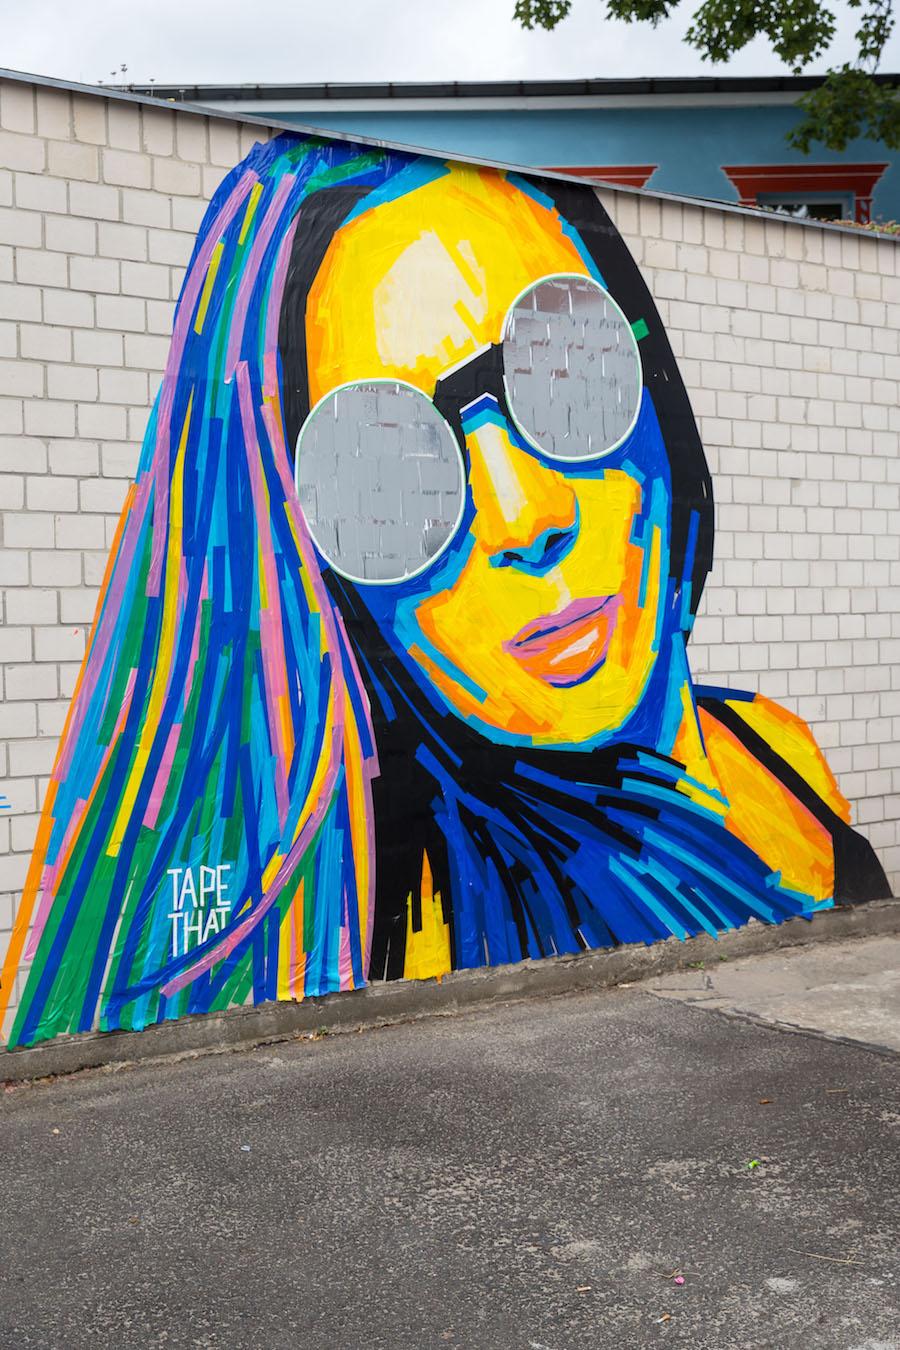 Tape Art, Convention, Berlin, Kunst, Kleben, Klebeband, 030, Berlin, Street Art, Urban, Art, Grafik